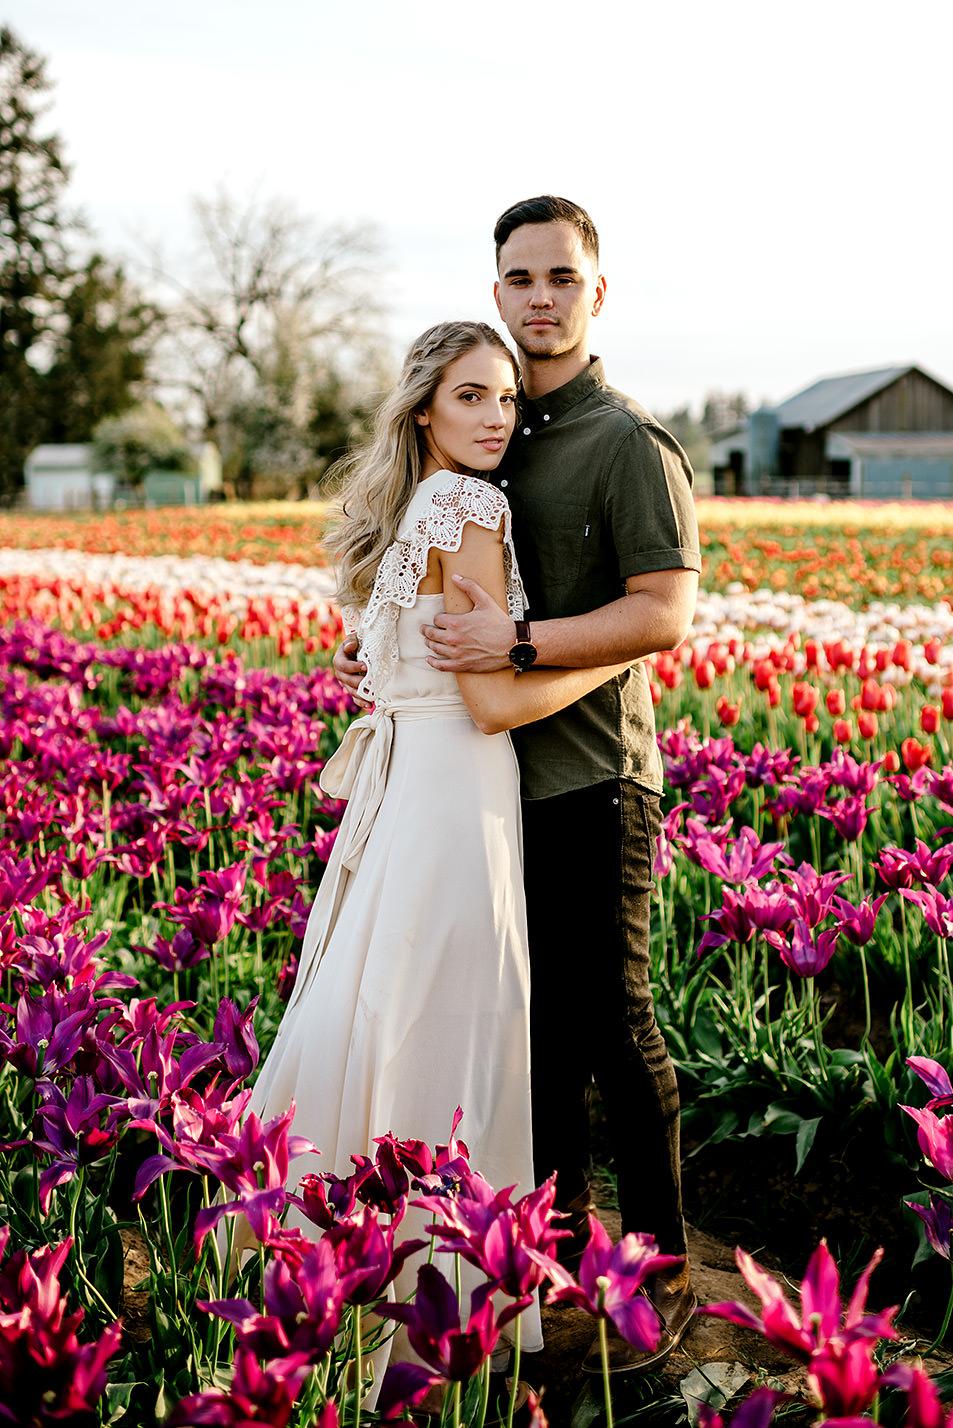 Tulip-field-engagement-session-Portland-Photographer-17.jpg